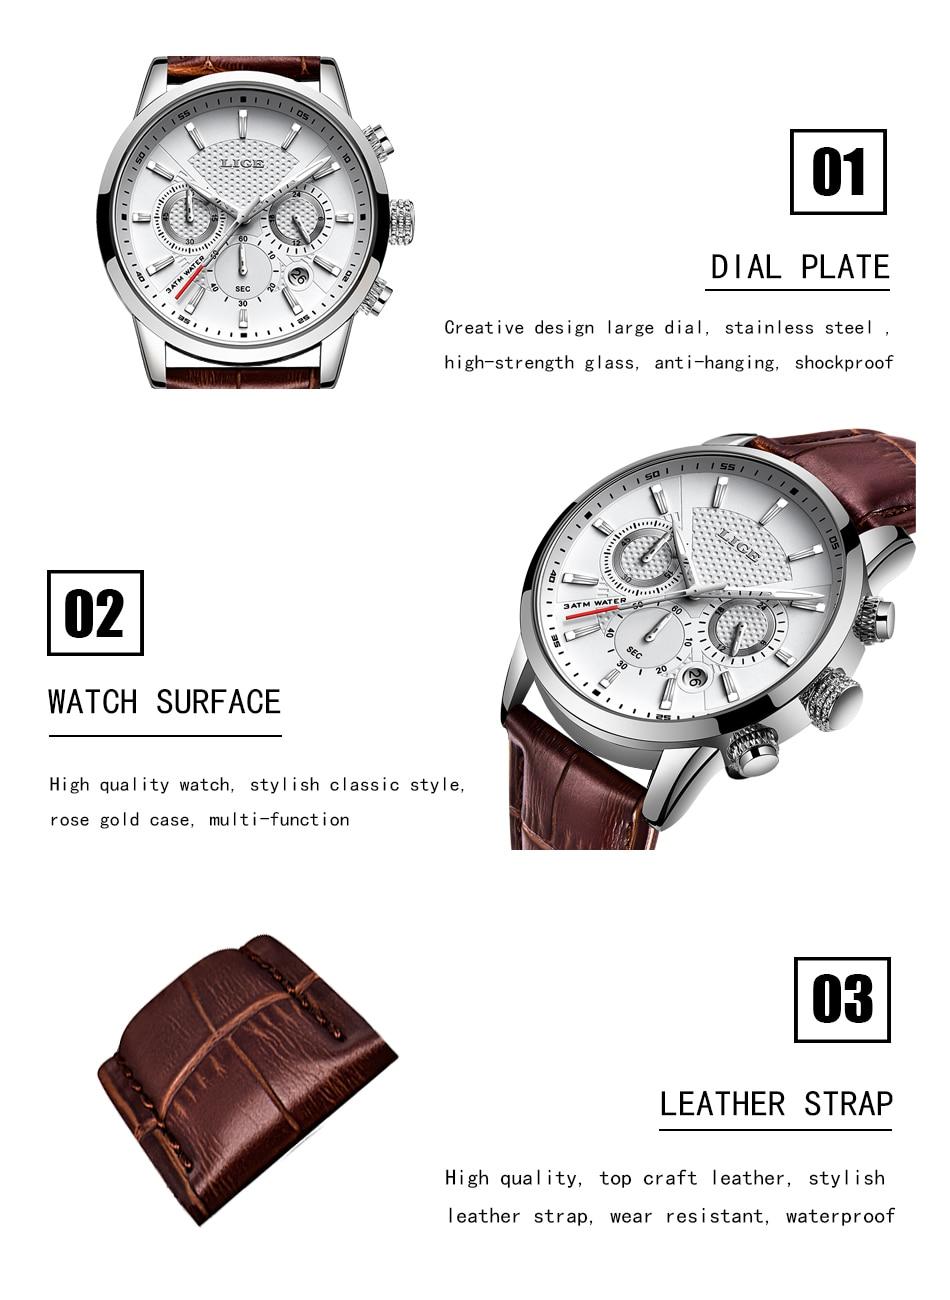 HTB1KHzFVmzqK1RjSZFHq6z3CpXaF LIGE 2020 New Watch Men Fashion Sport Quartz Clock Mens Watches Brand Luxury Leather Business Waterproof Watch Relogio Masculino